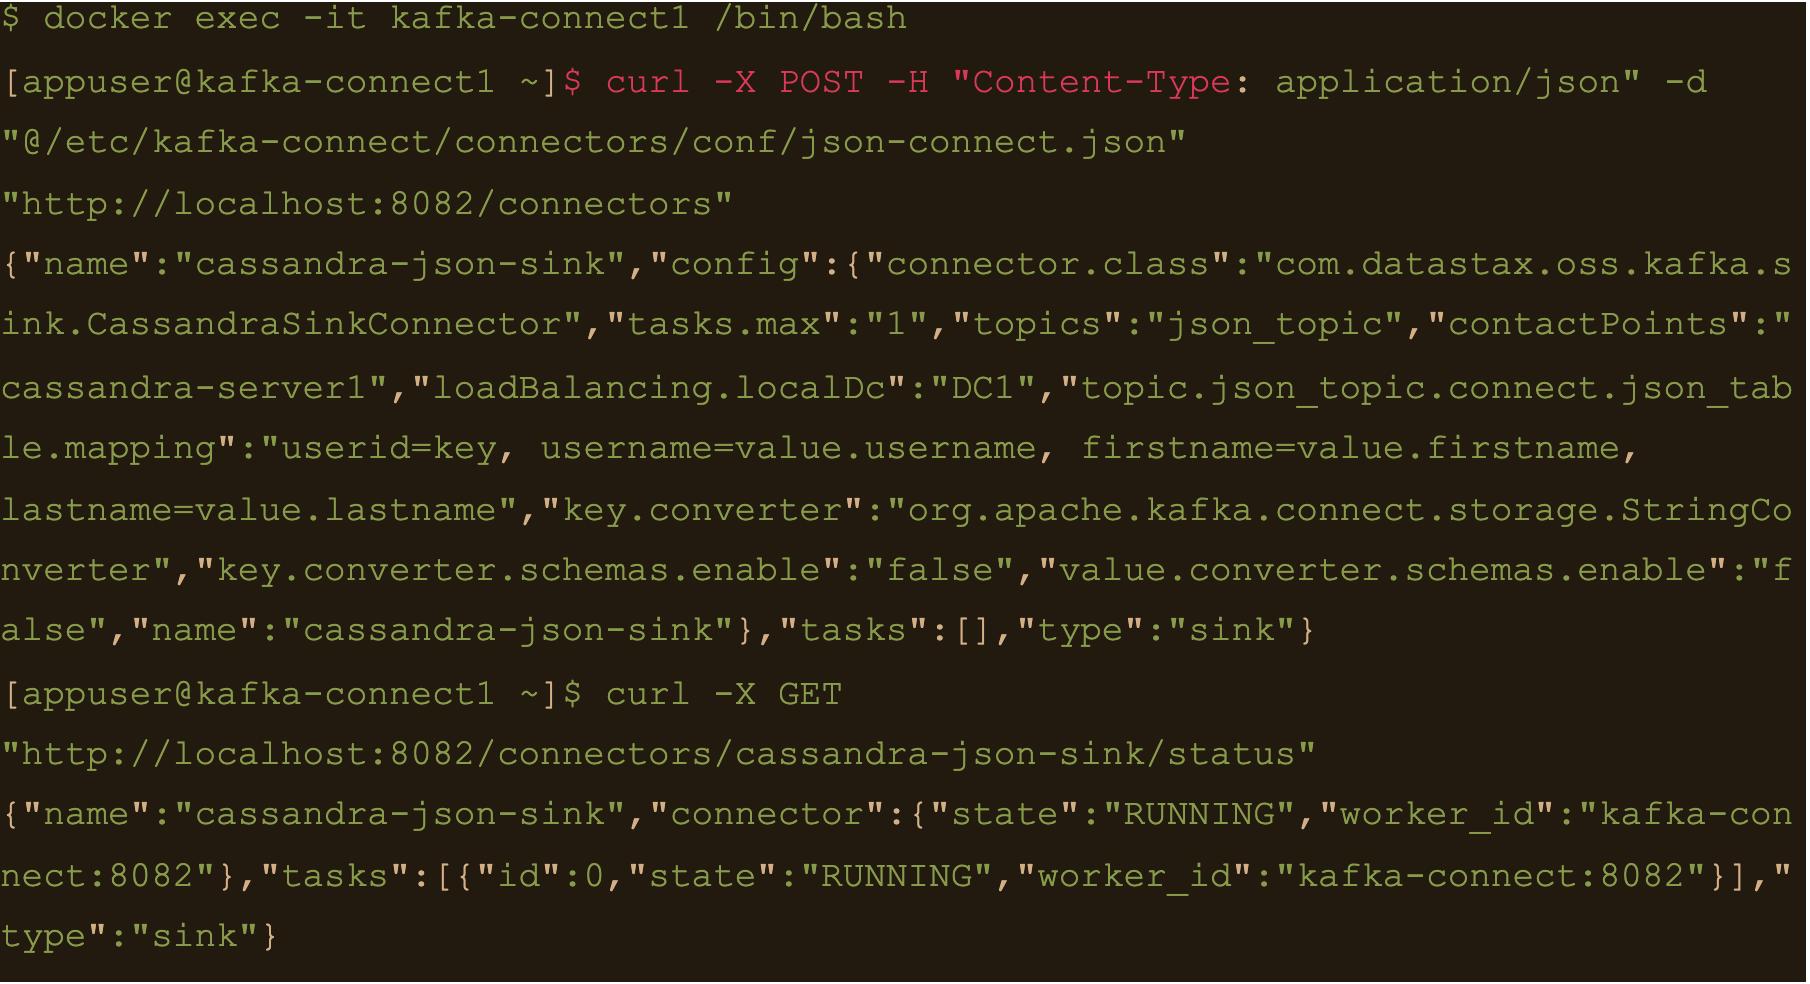 "curl -X GET ""http://localhost:8082/connectors/cassandra-json-sink/status"